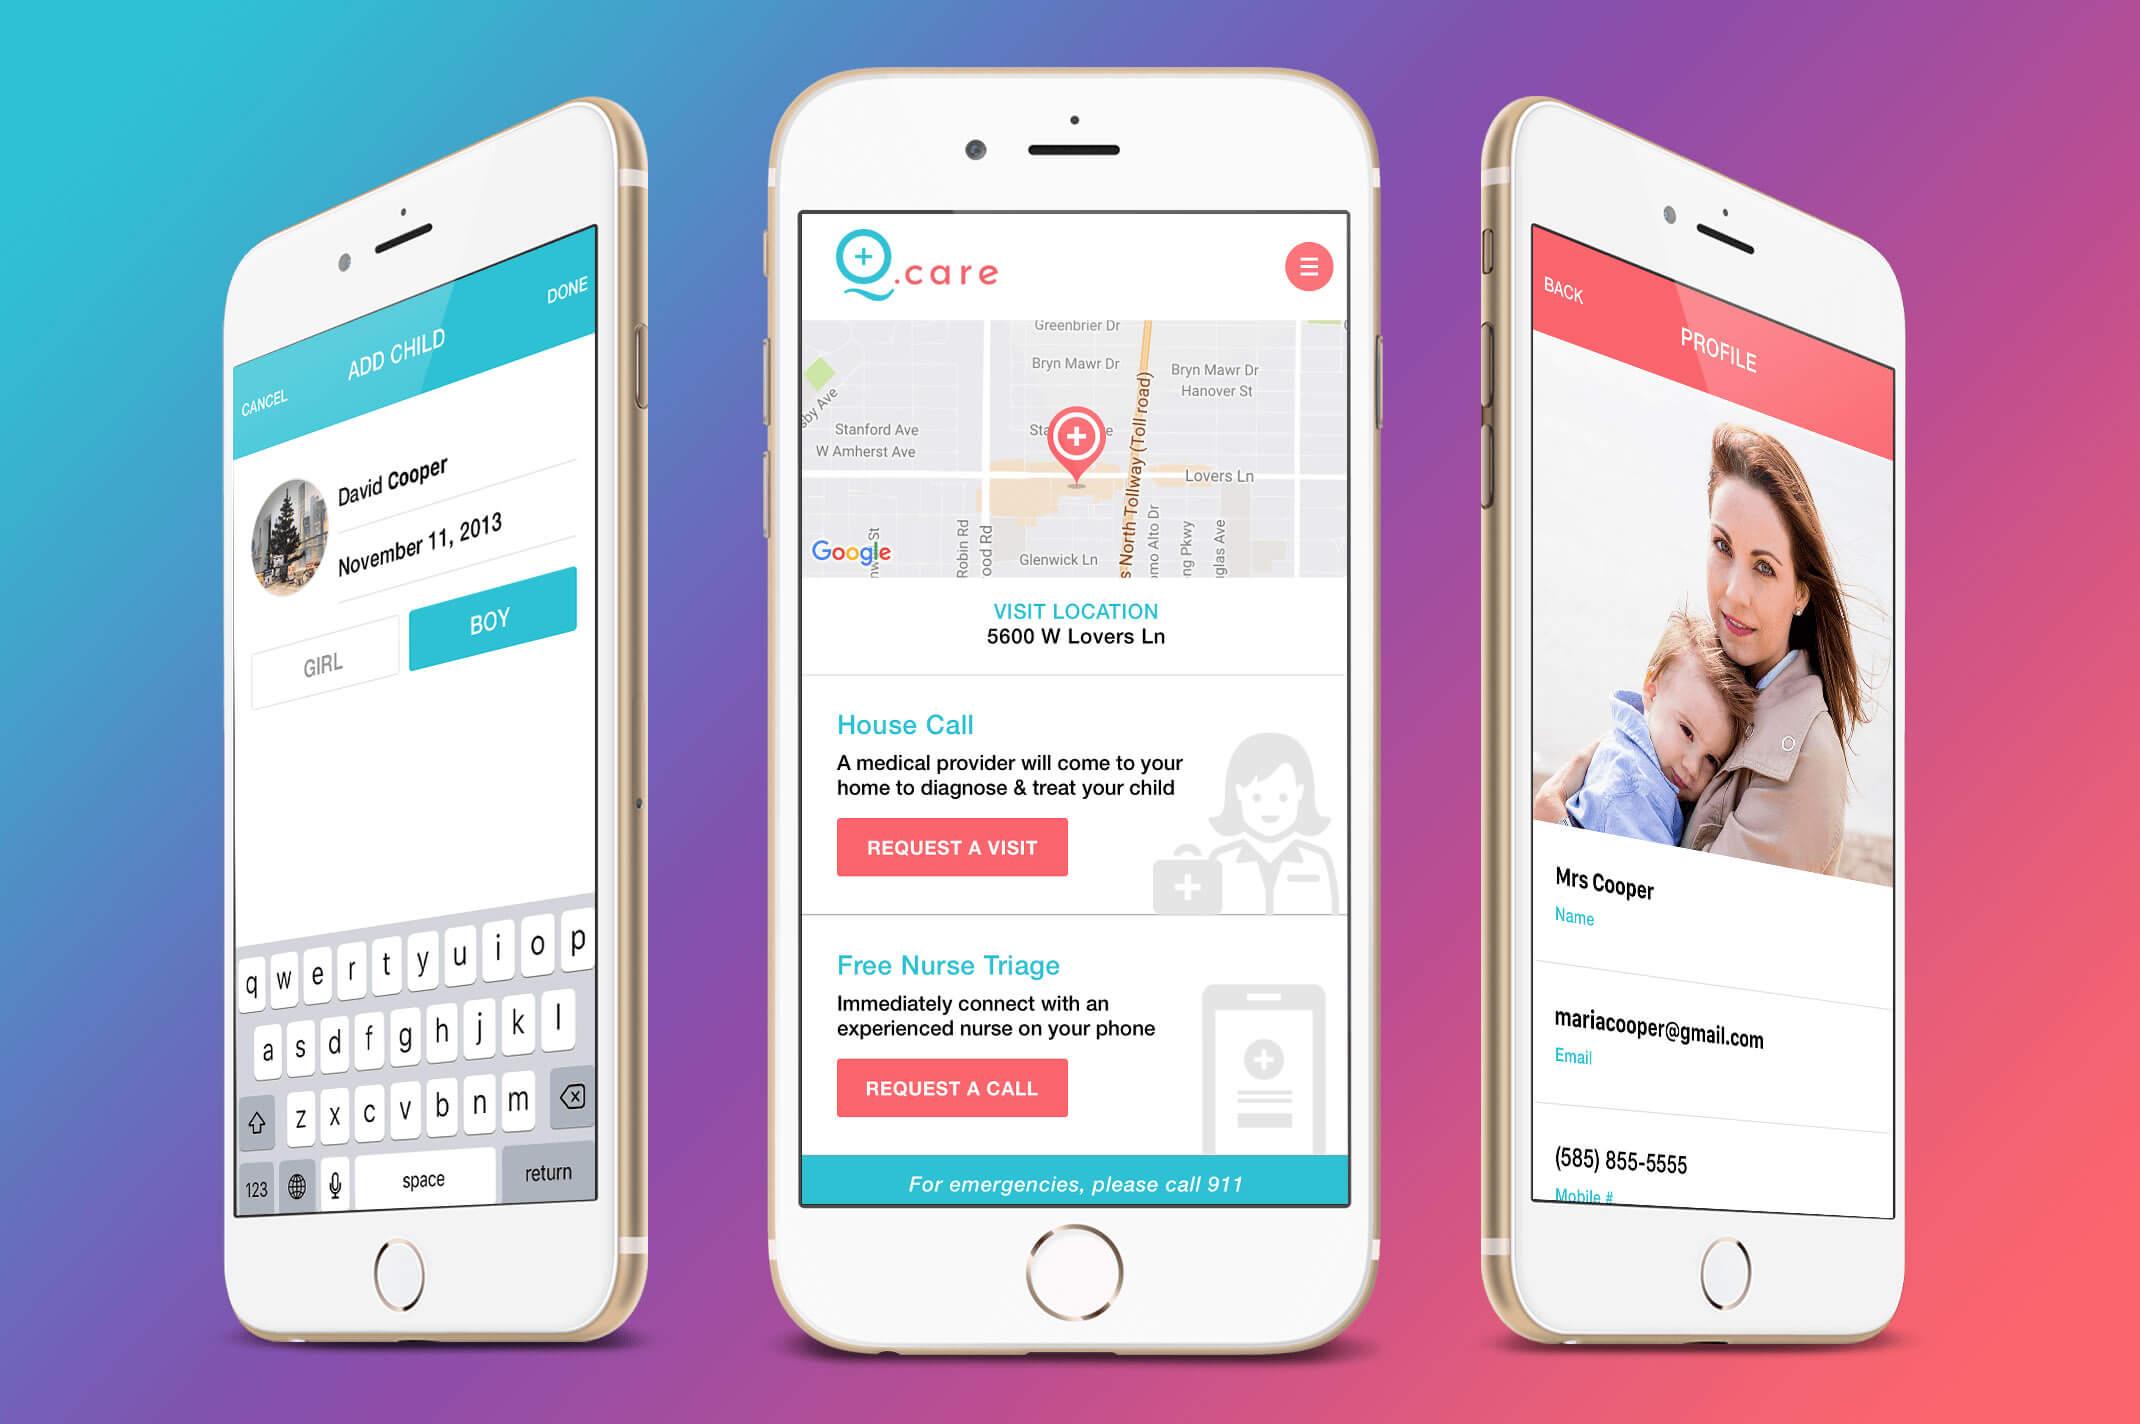 qcare-app-devices